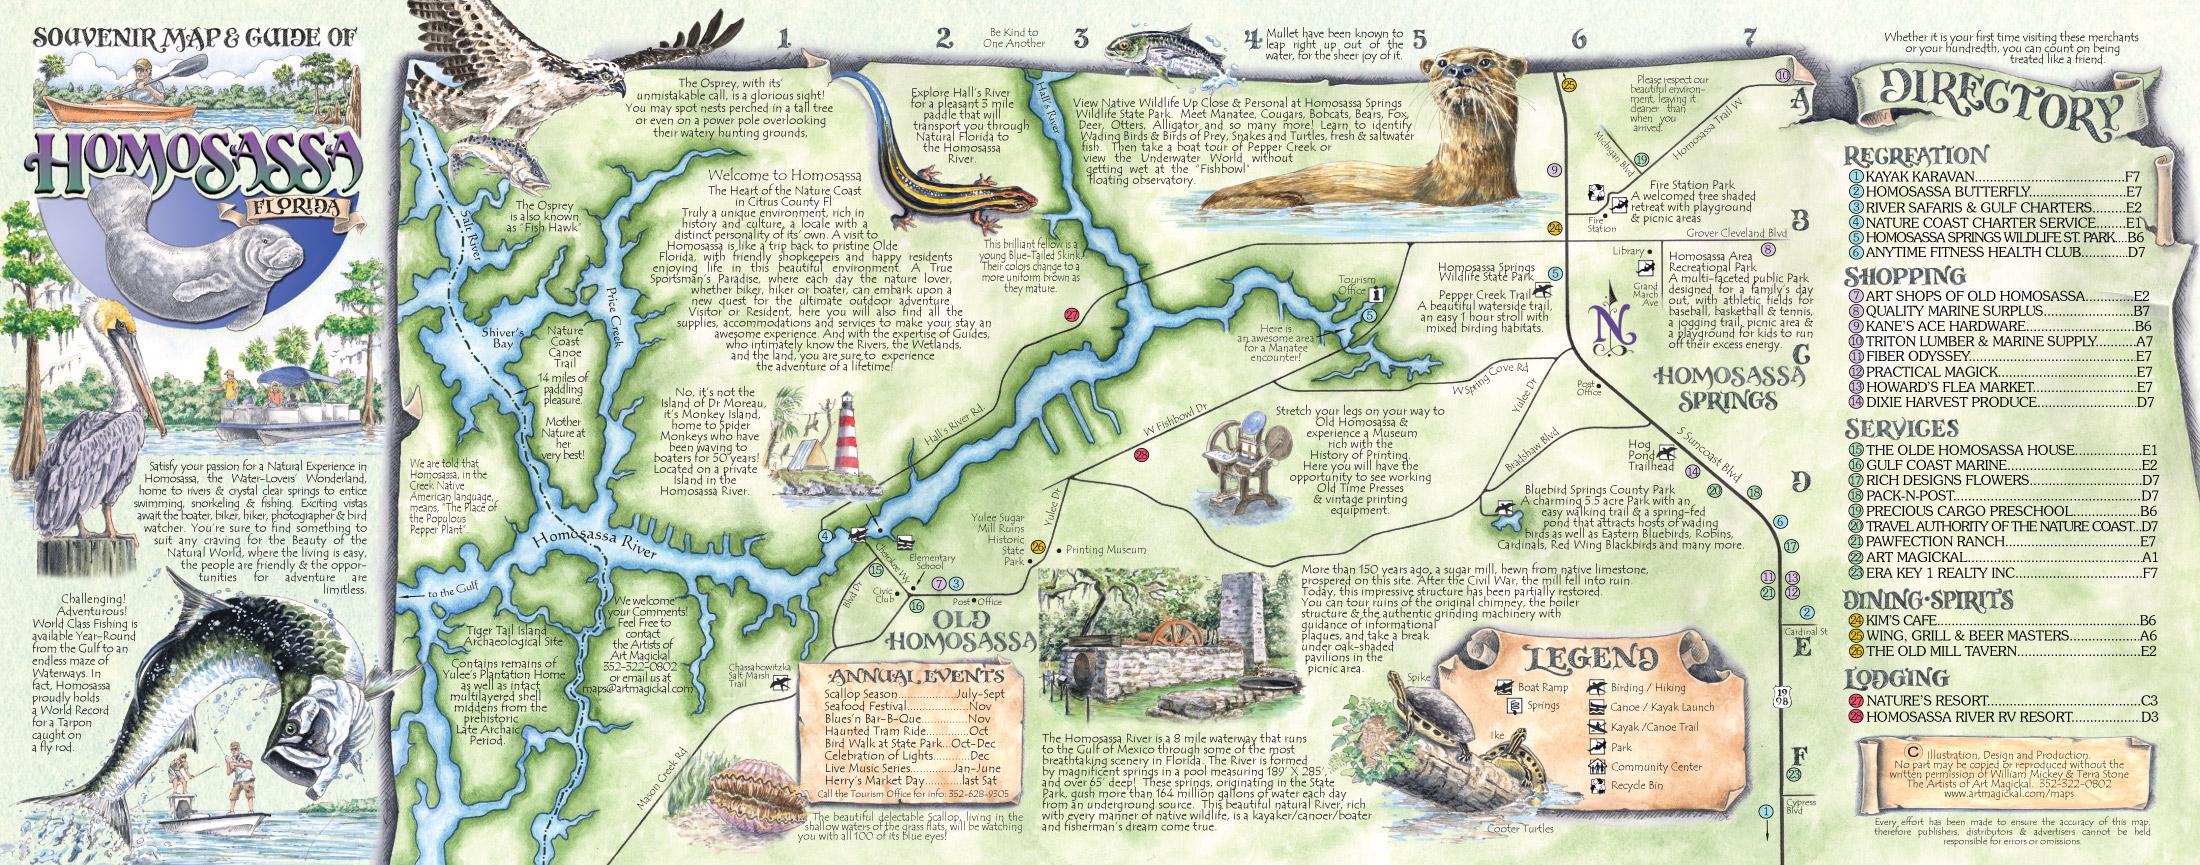 The Souvenir Map & Guide Of Homosassa Springs Fl - Florida Springs Map